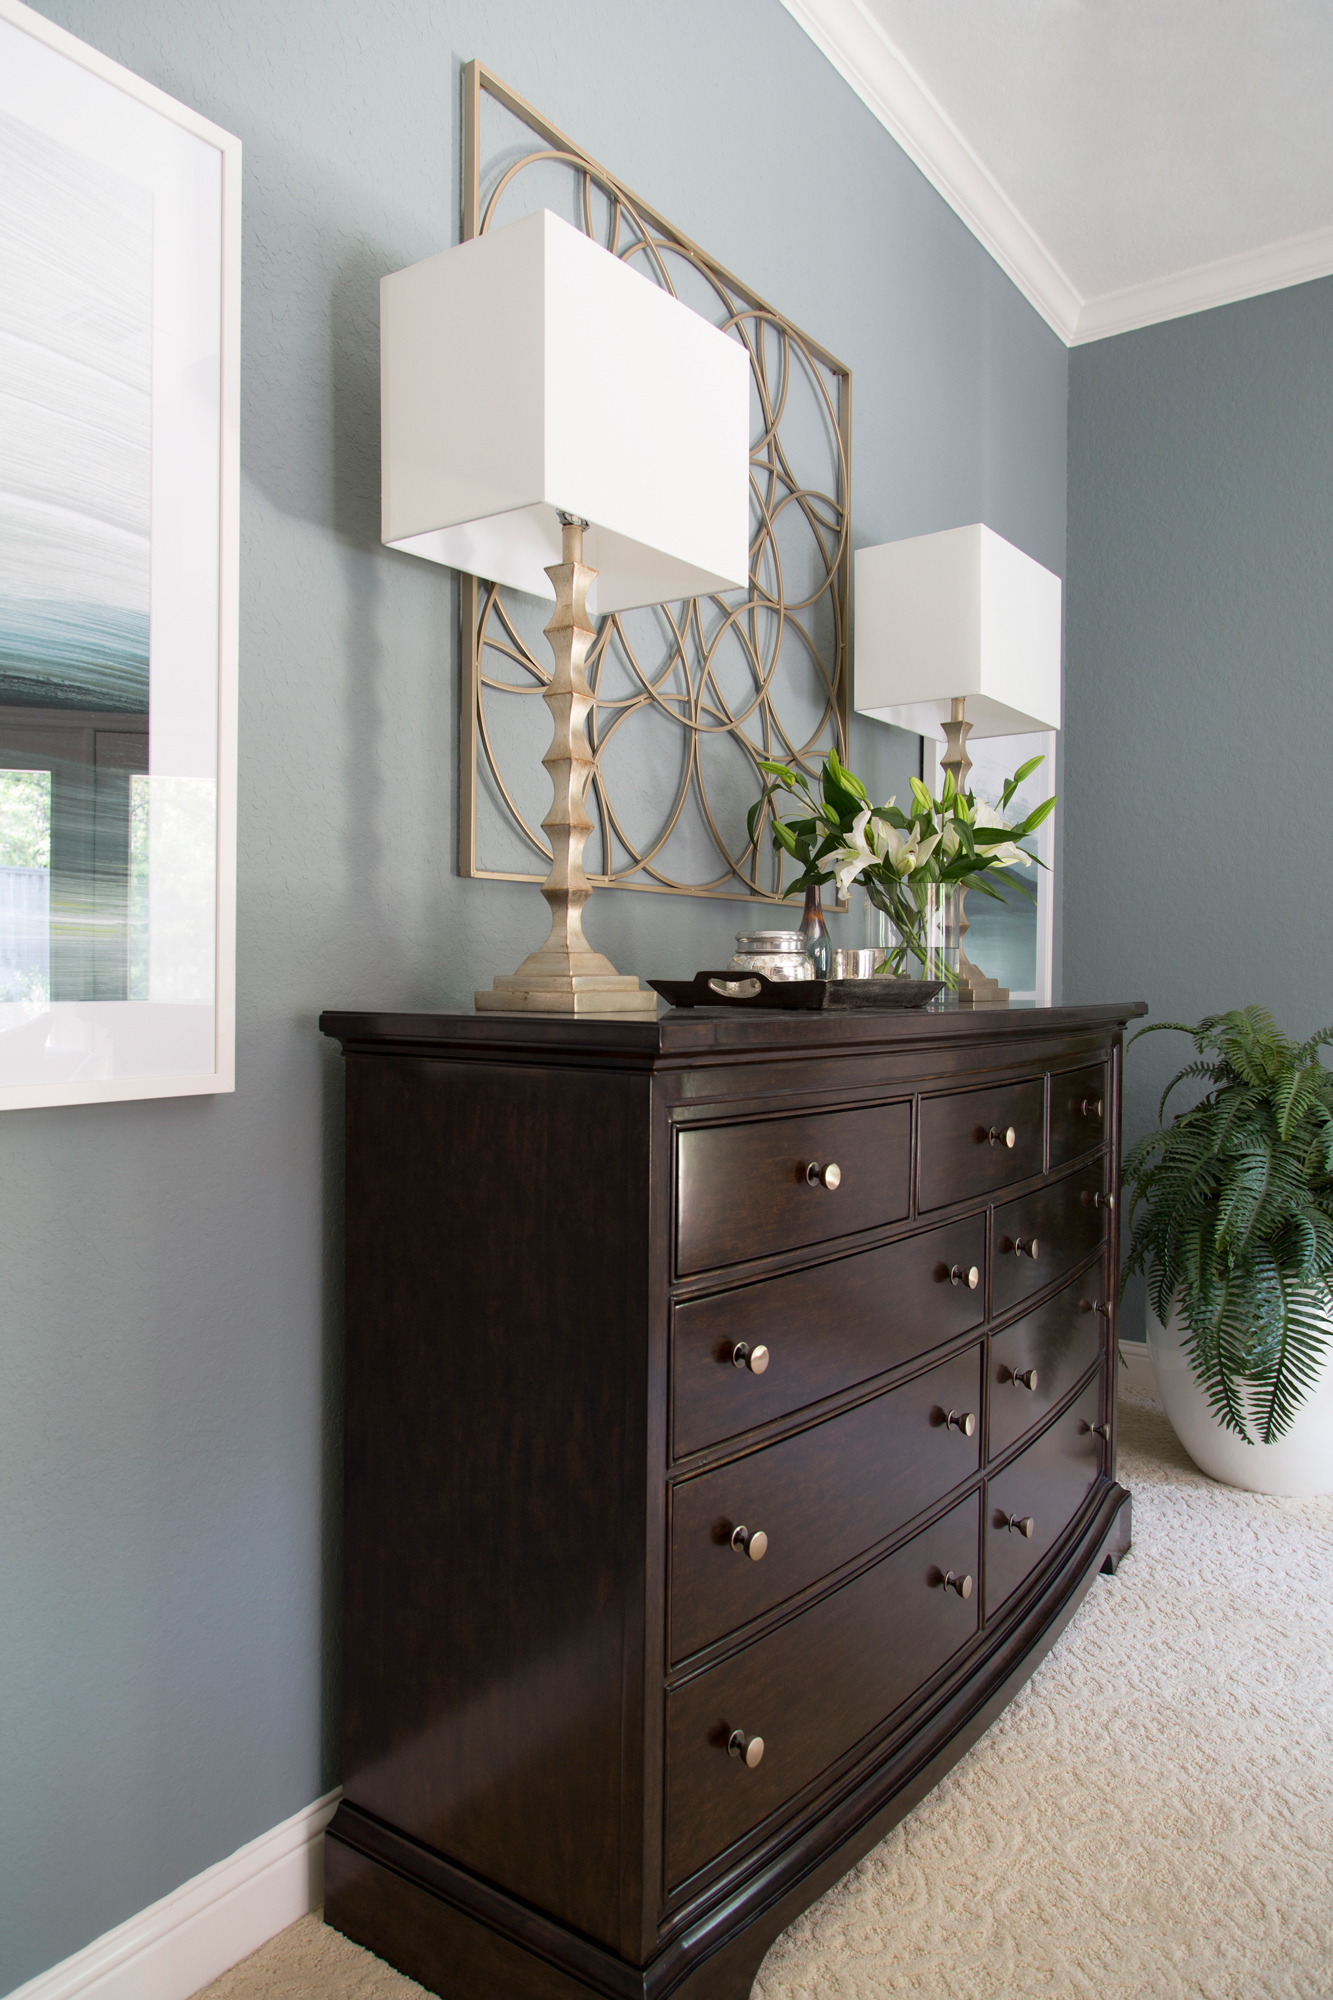 Master Bedroom Redo - dresser, artwork, lamps, Designer: Carla Aston